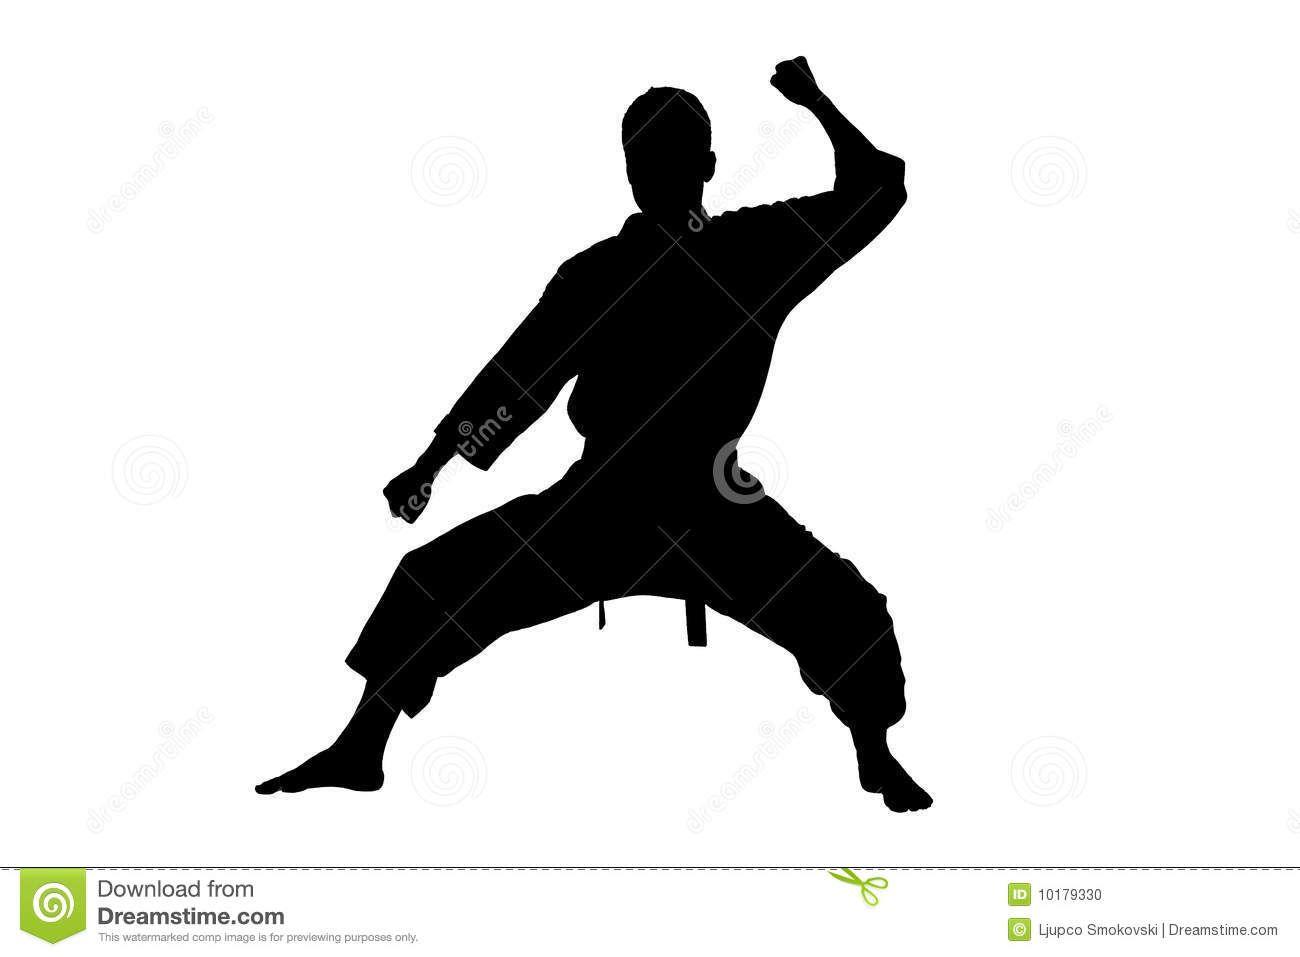 Karate Silhouette Clipart Clipart Suggest Karate Silhouette Clip Art